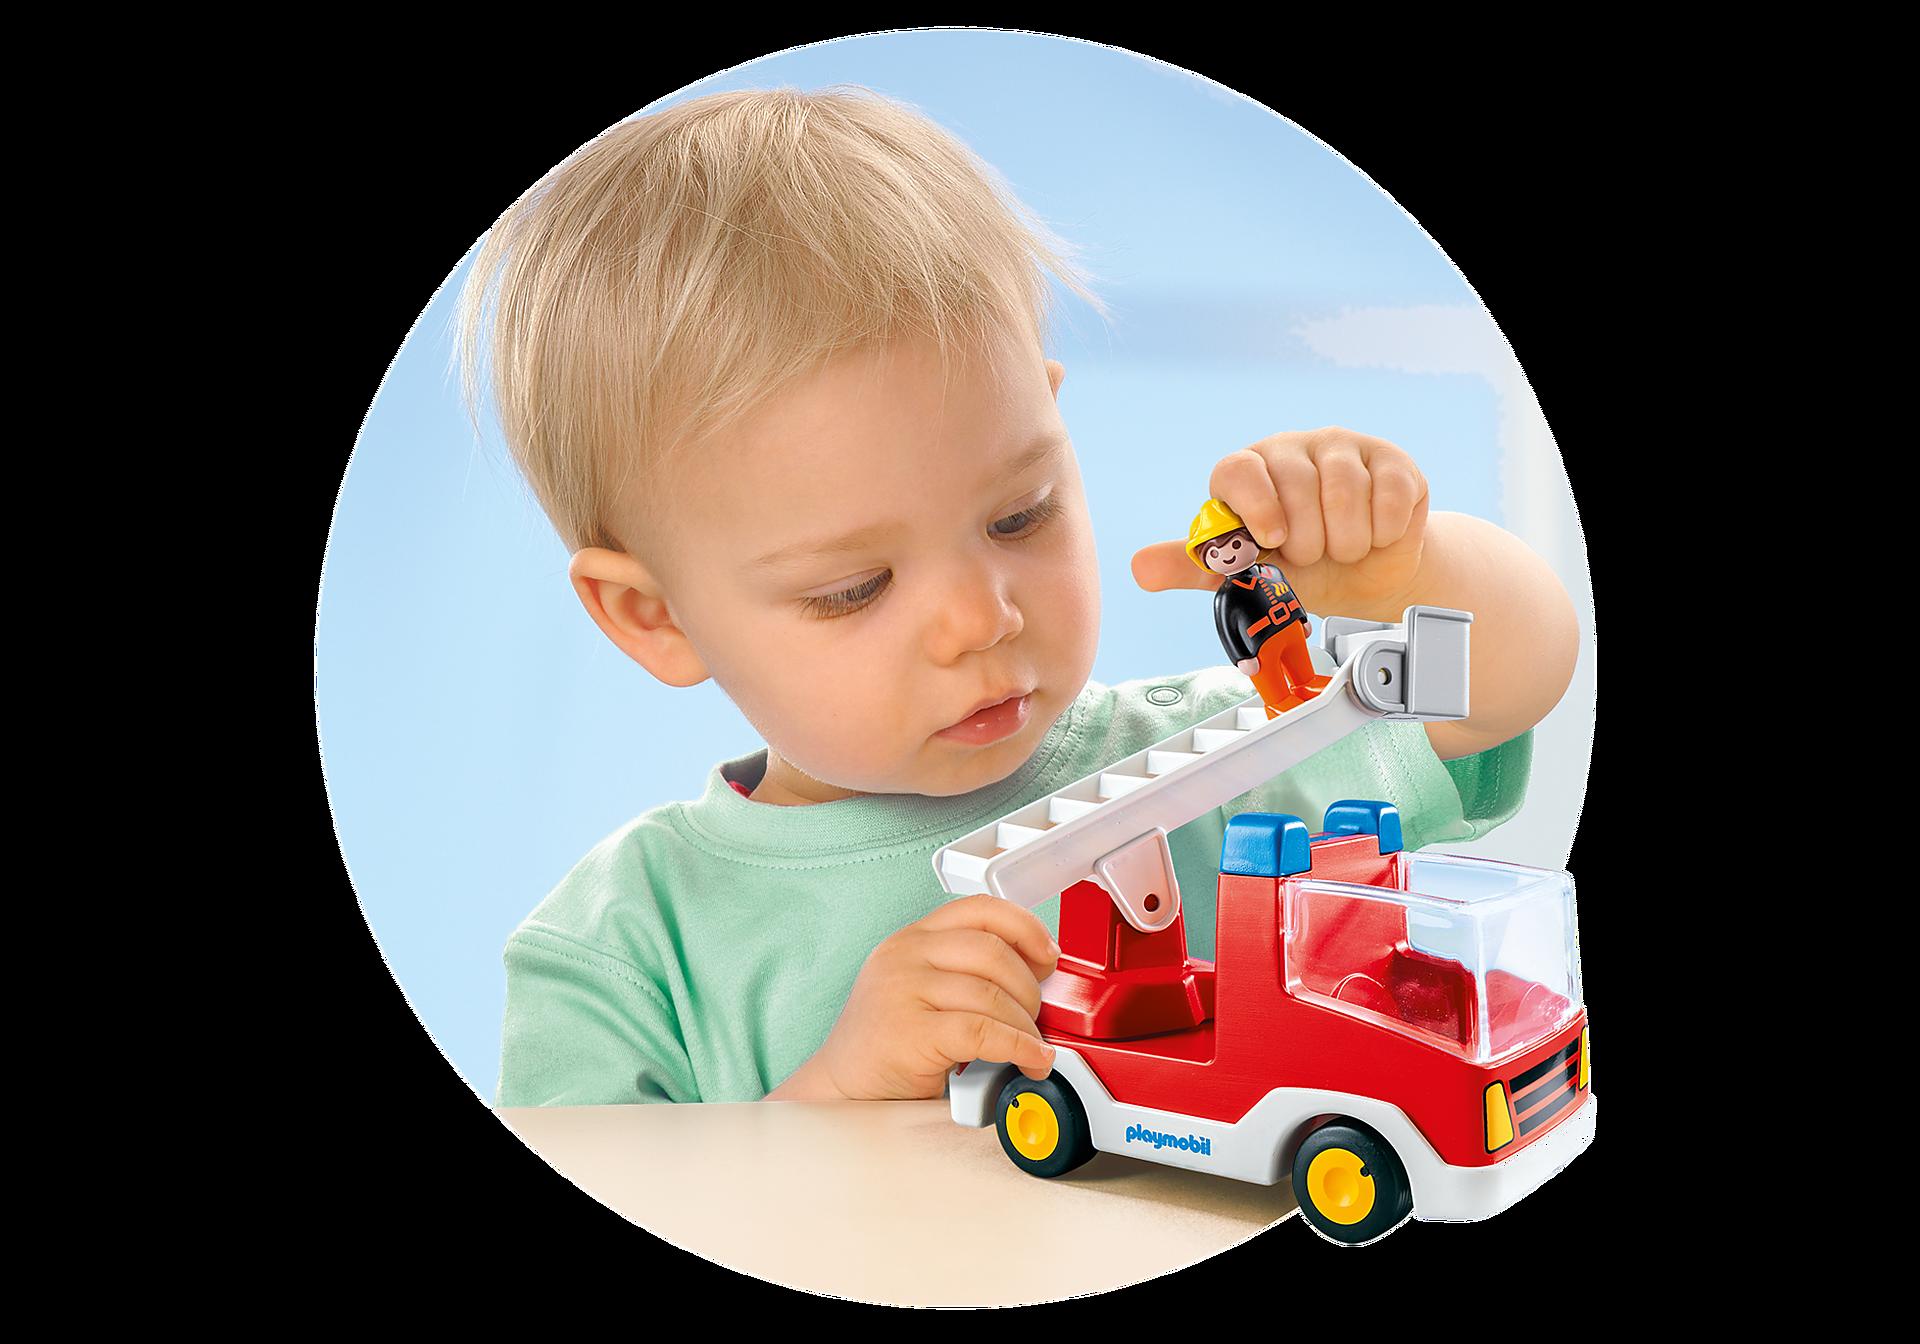 http://media.playmobil.com/i/playmobil/6967_product_extra1/Camion de pompier avec échelle pivotante